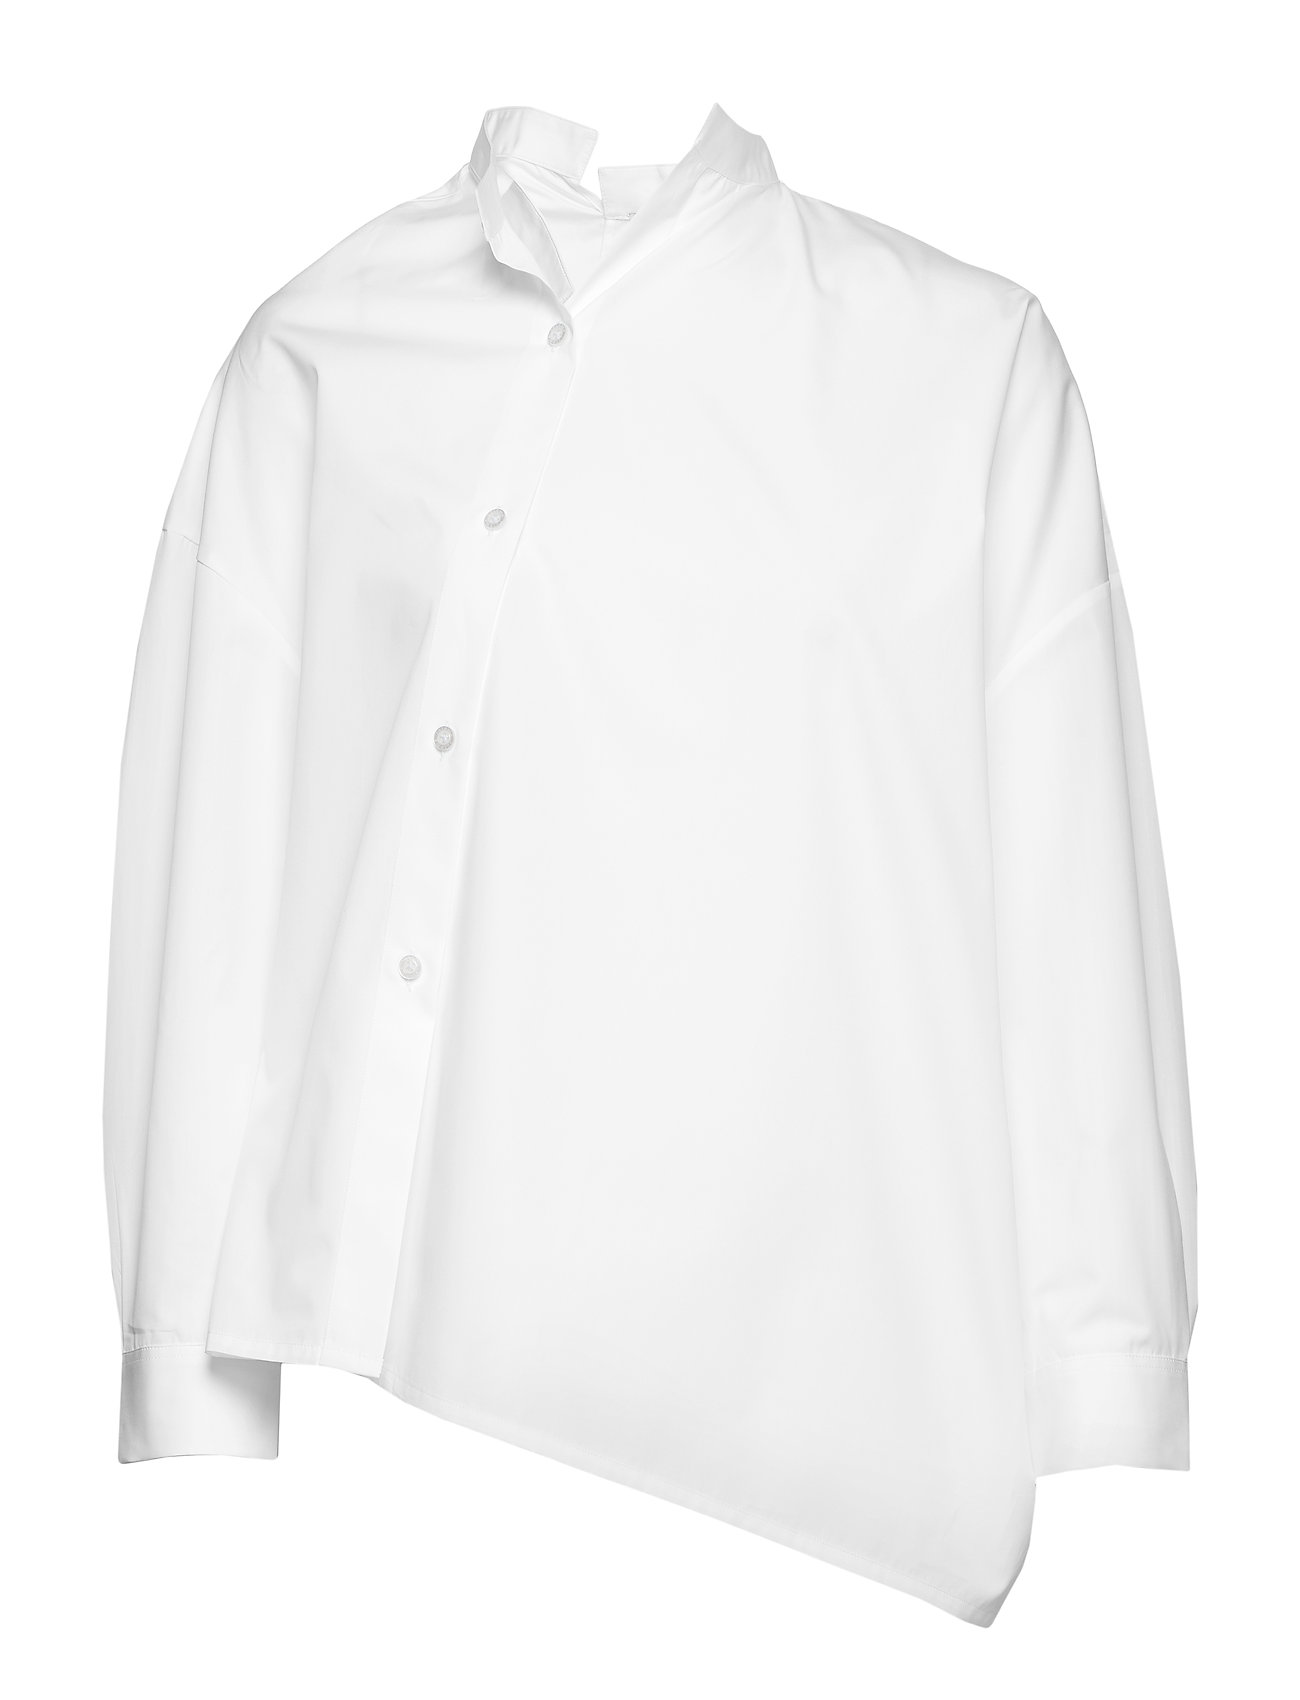 Totême NOMA - WHITE 100